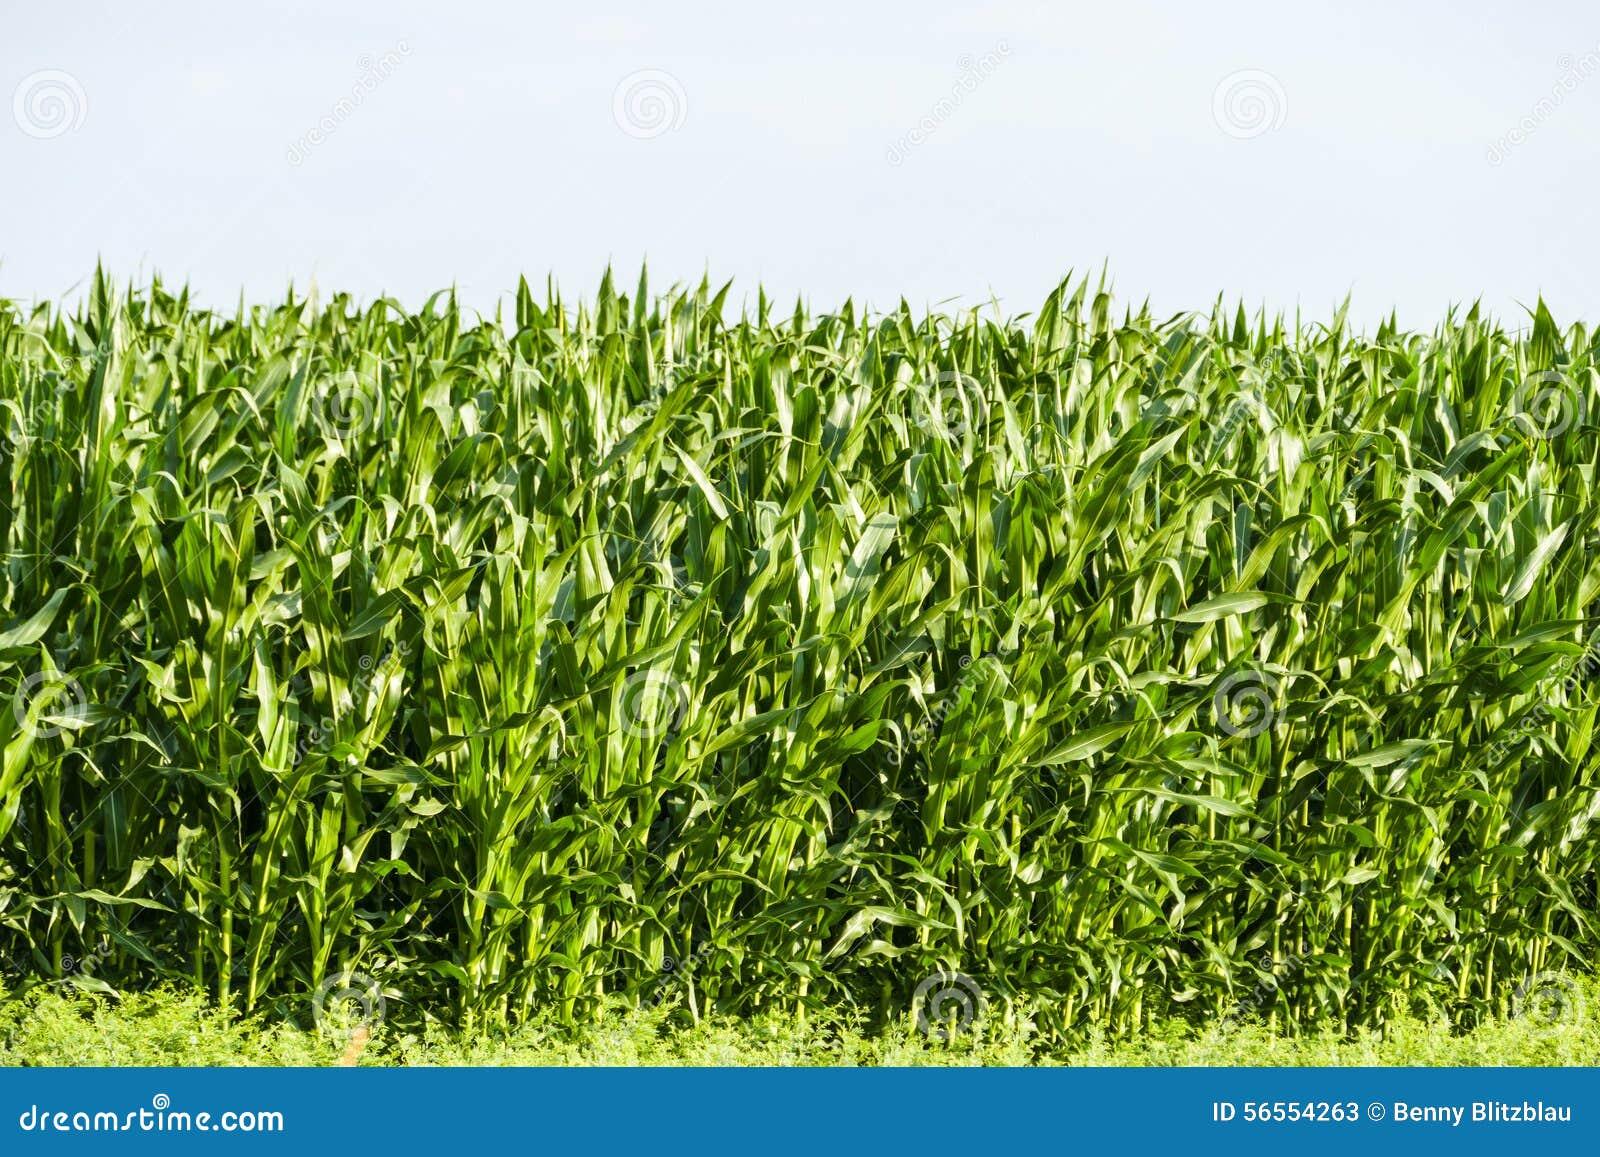 Download Νέο πεδίο καλαμποκιού στοκ εικόνα. εικόνα από σειρά, σιτάρι - 56554263